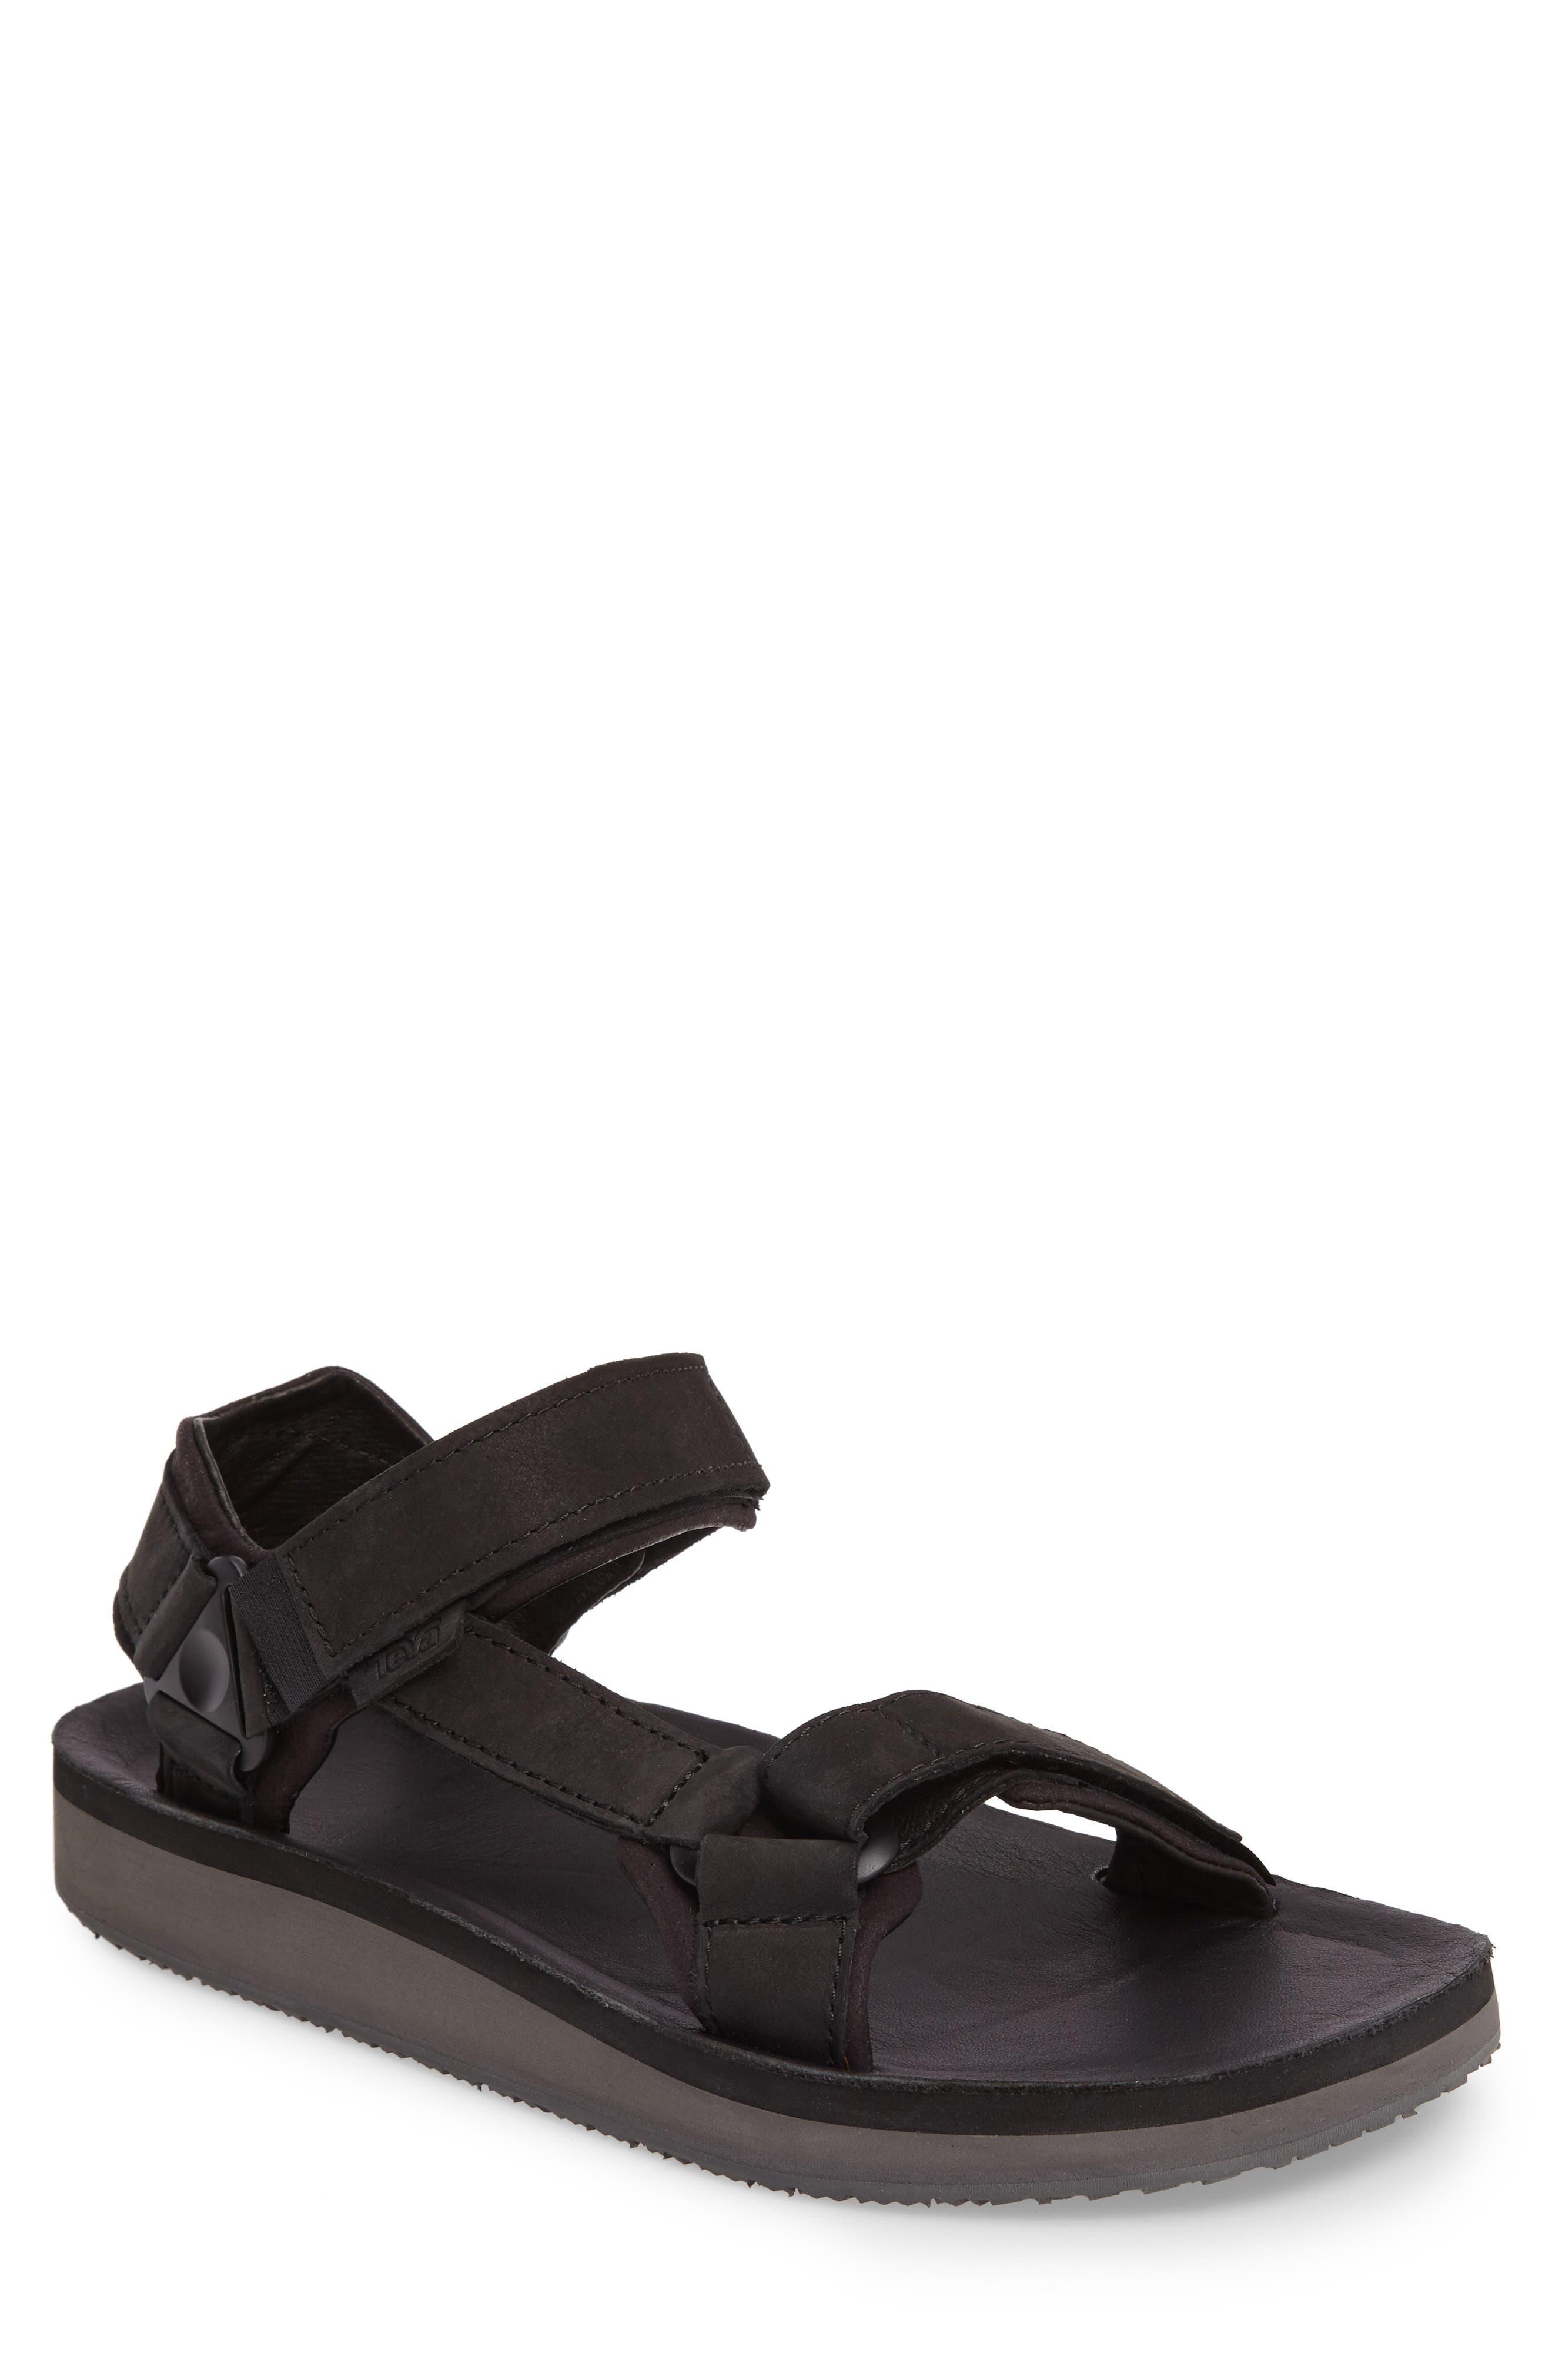 Original Universal Premier Sandal,                         Main,                         color, 001